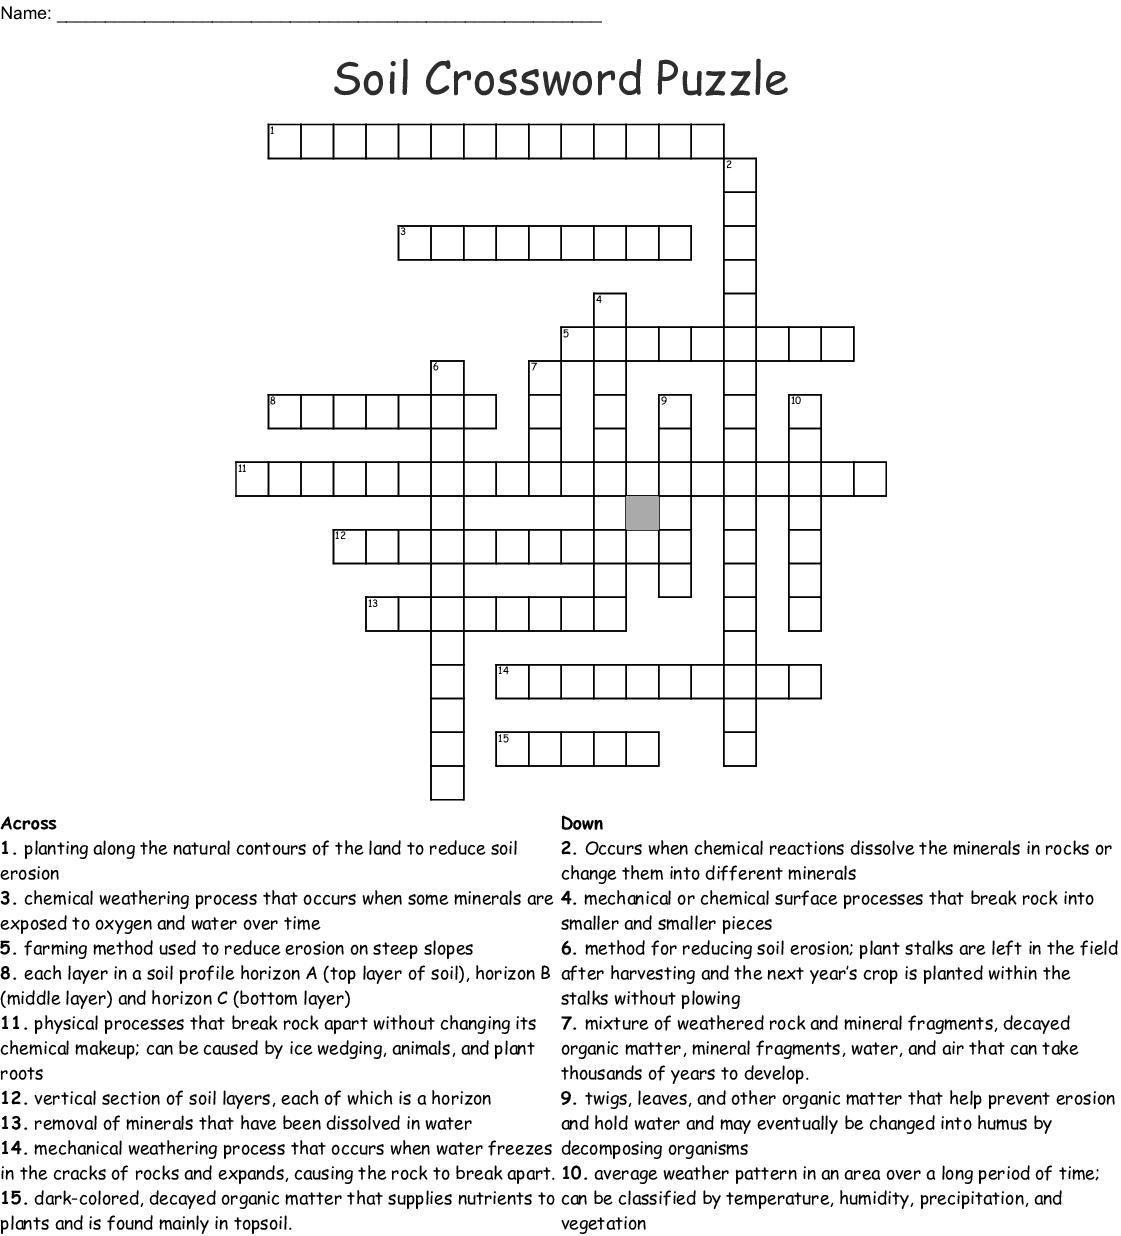 Soil Crossword Puzzle